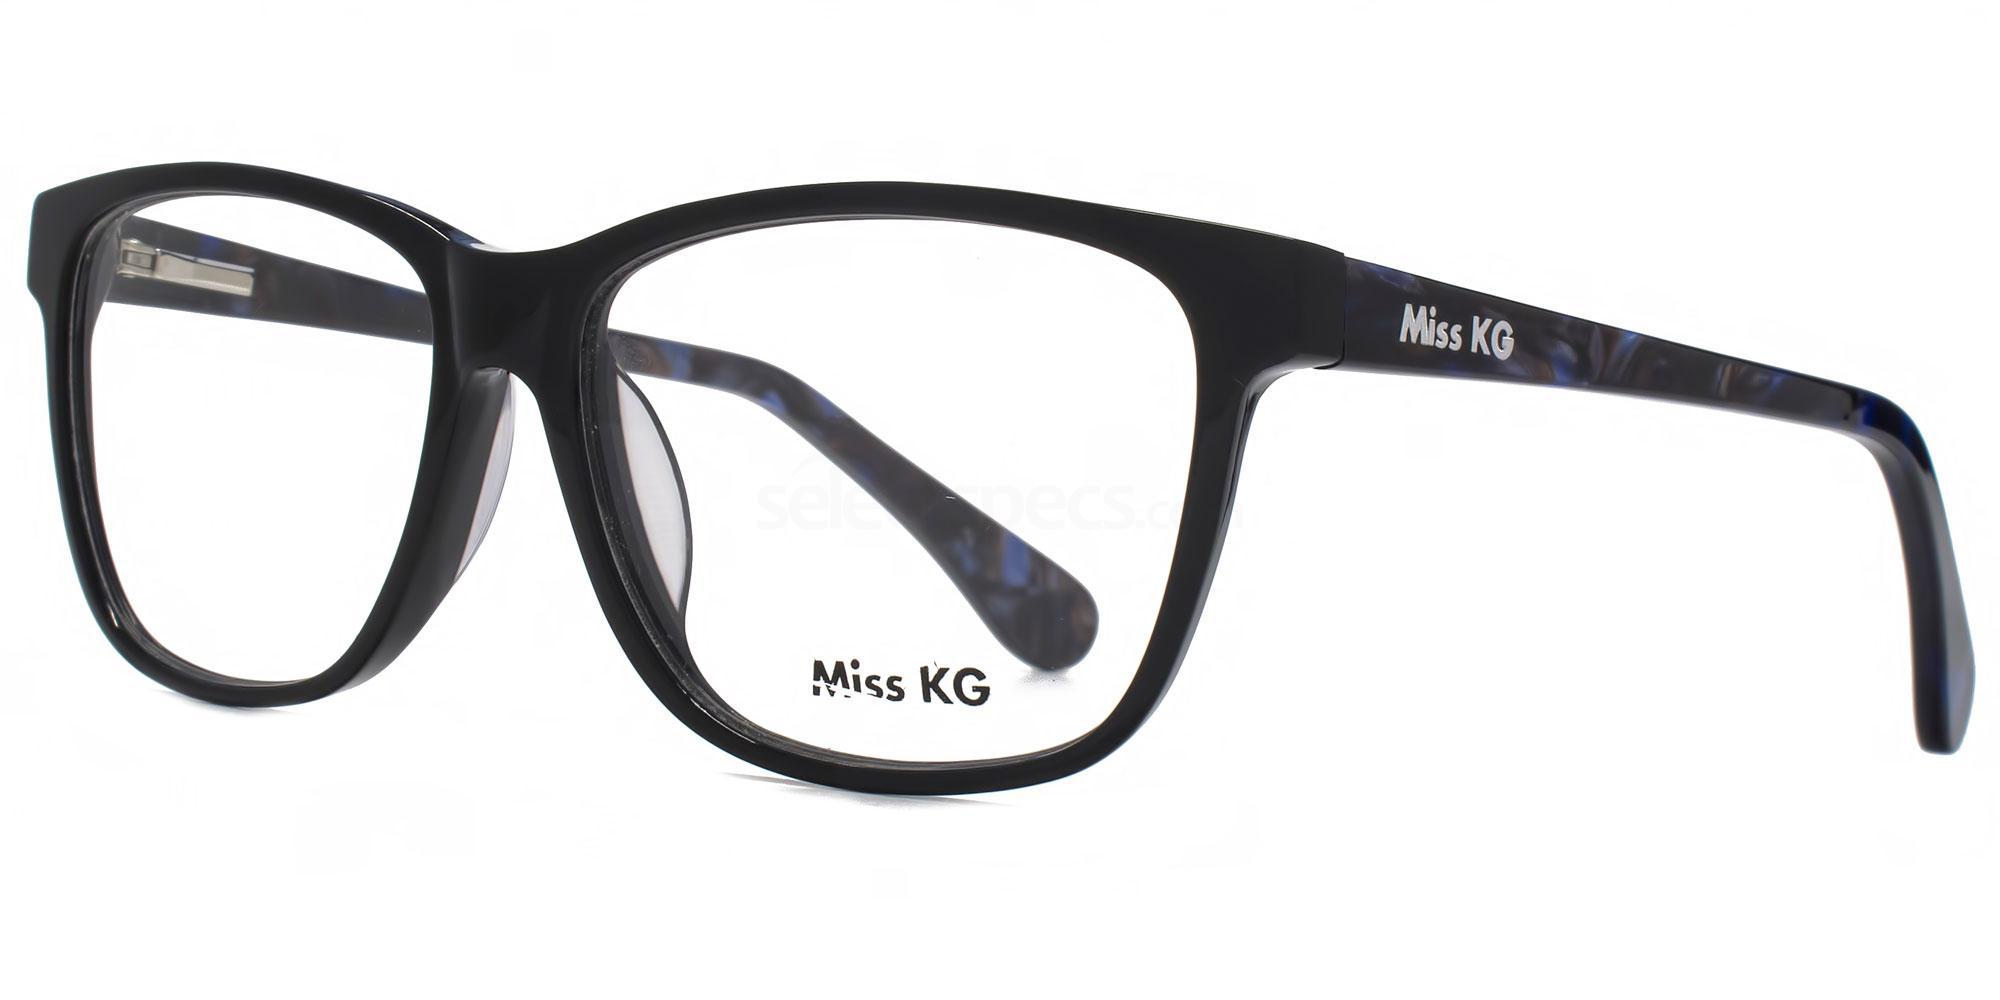 BLK MKGS014 - Izzi Glasses, Miss KG